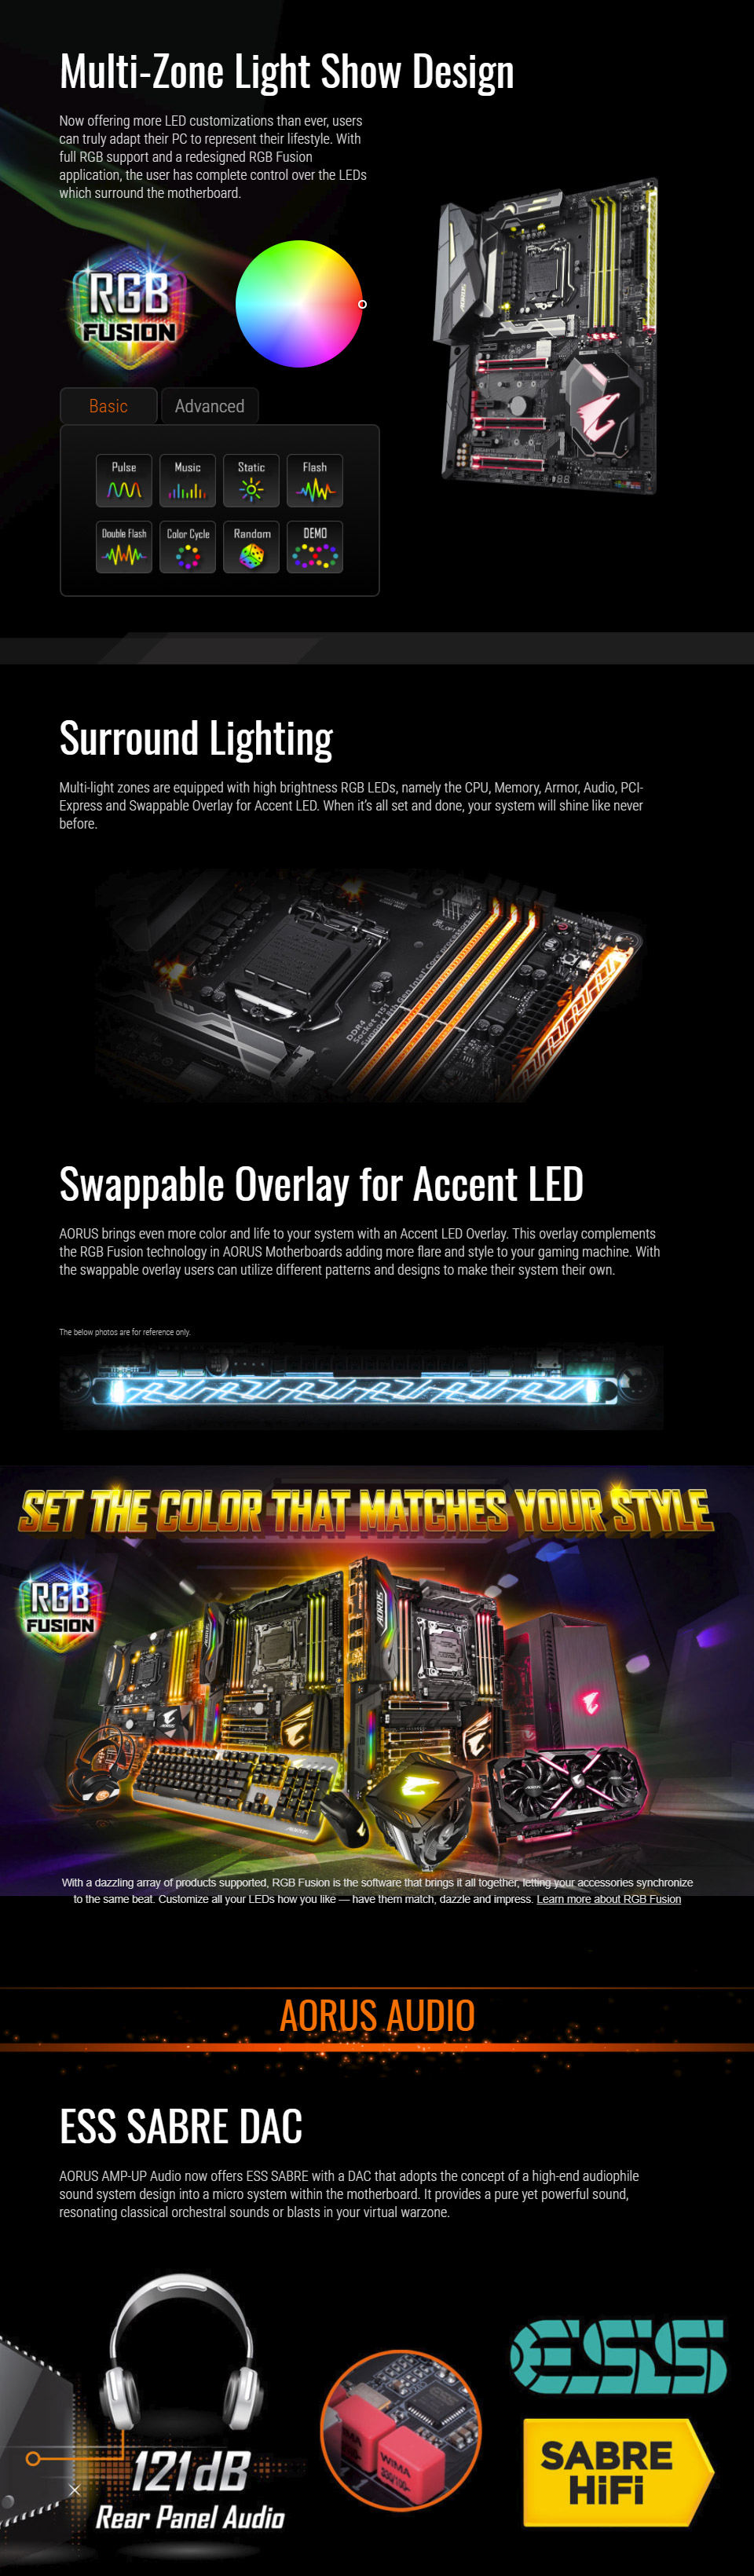 GIGABYTE Z370 AORUS Gaming 7 Intel LGA1151/ATX/Front USB 3 1/RGB Fusion  Motherboard